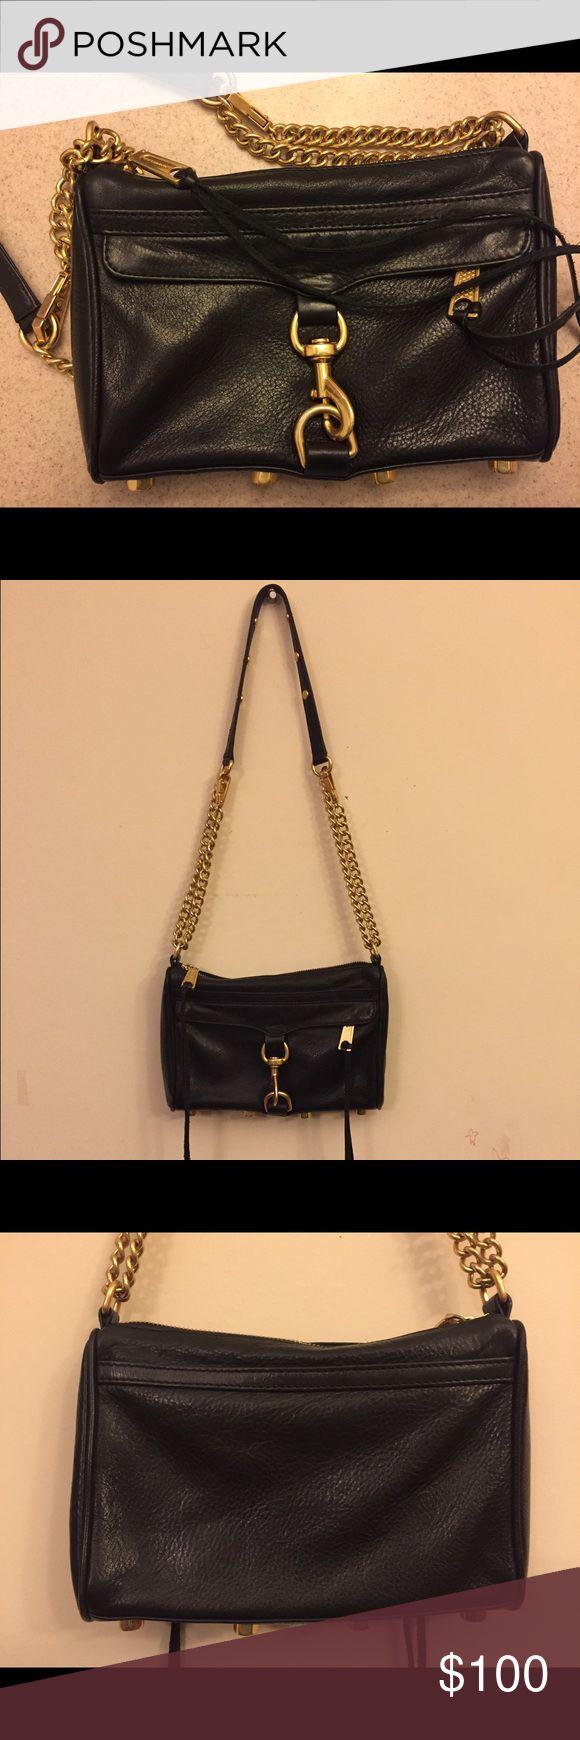 Rebecca Minkoff Mini MAC Crossbody Bag Rebecca Minkoff Crossbody Bag Rebecca Minkoff Bags Crossbody Bags